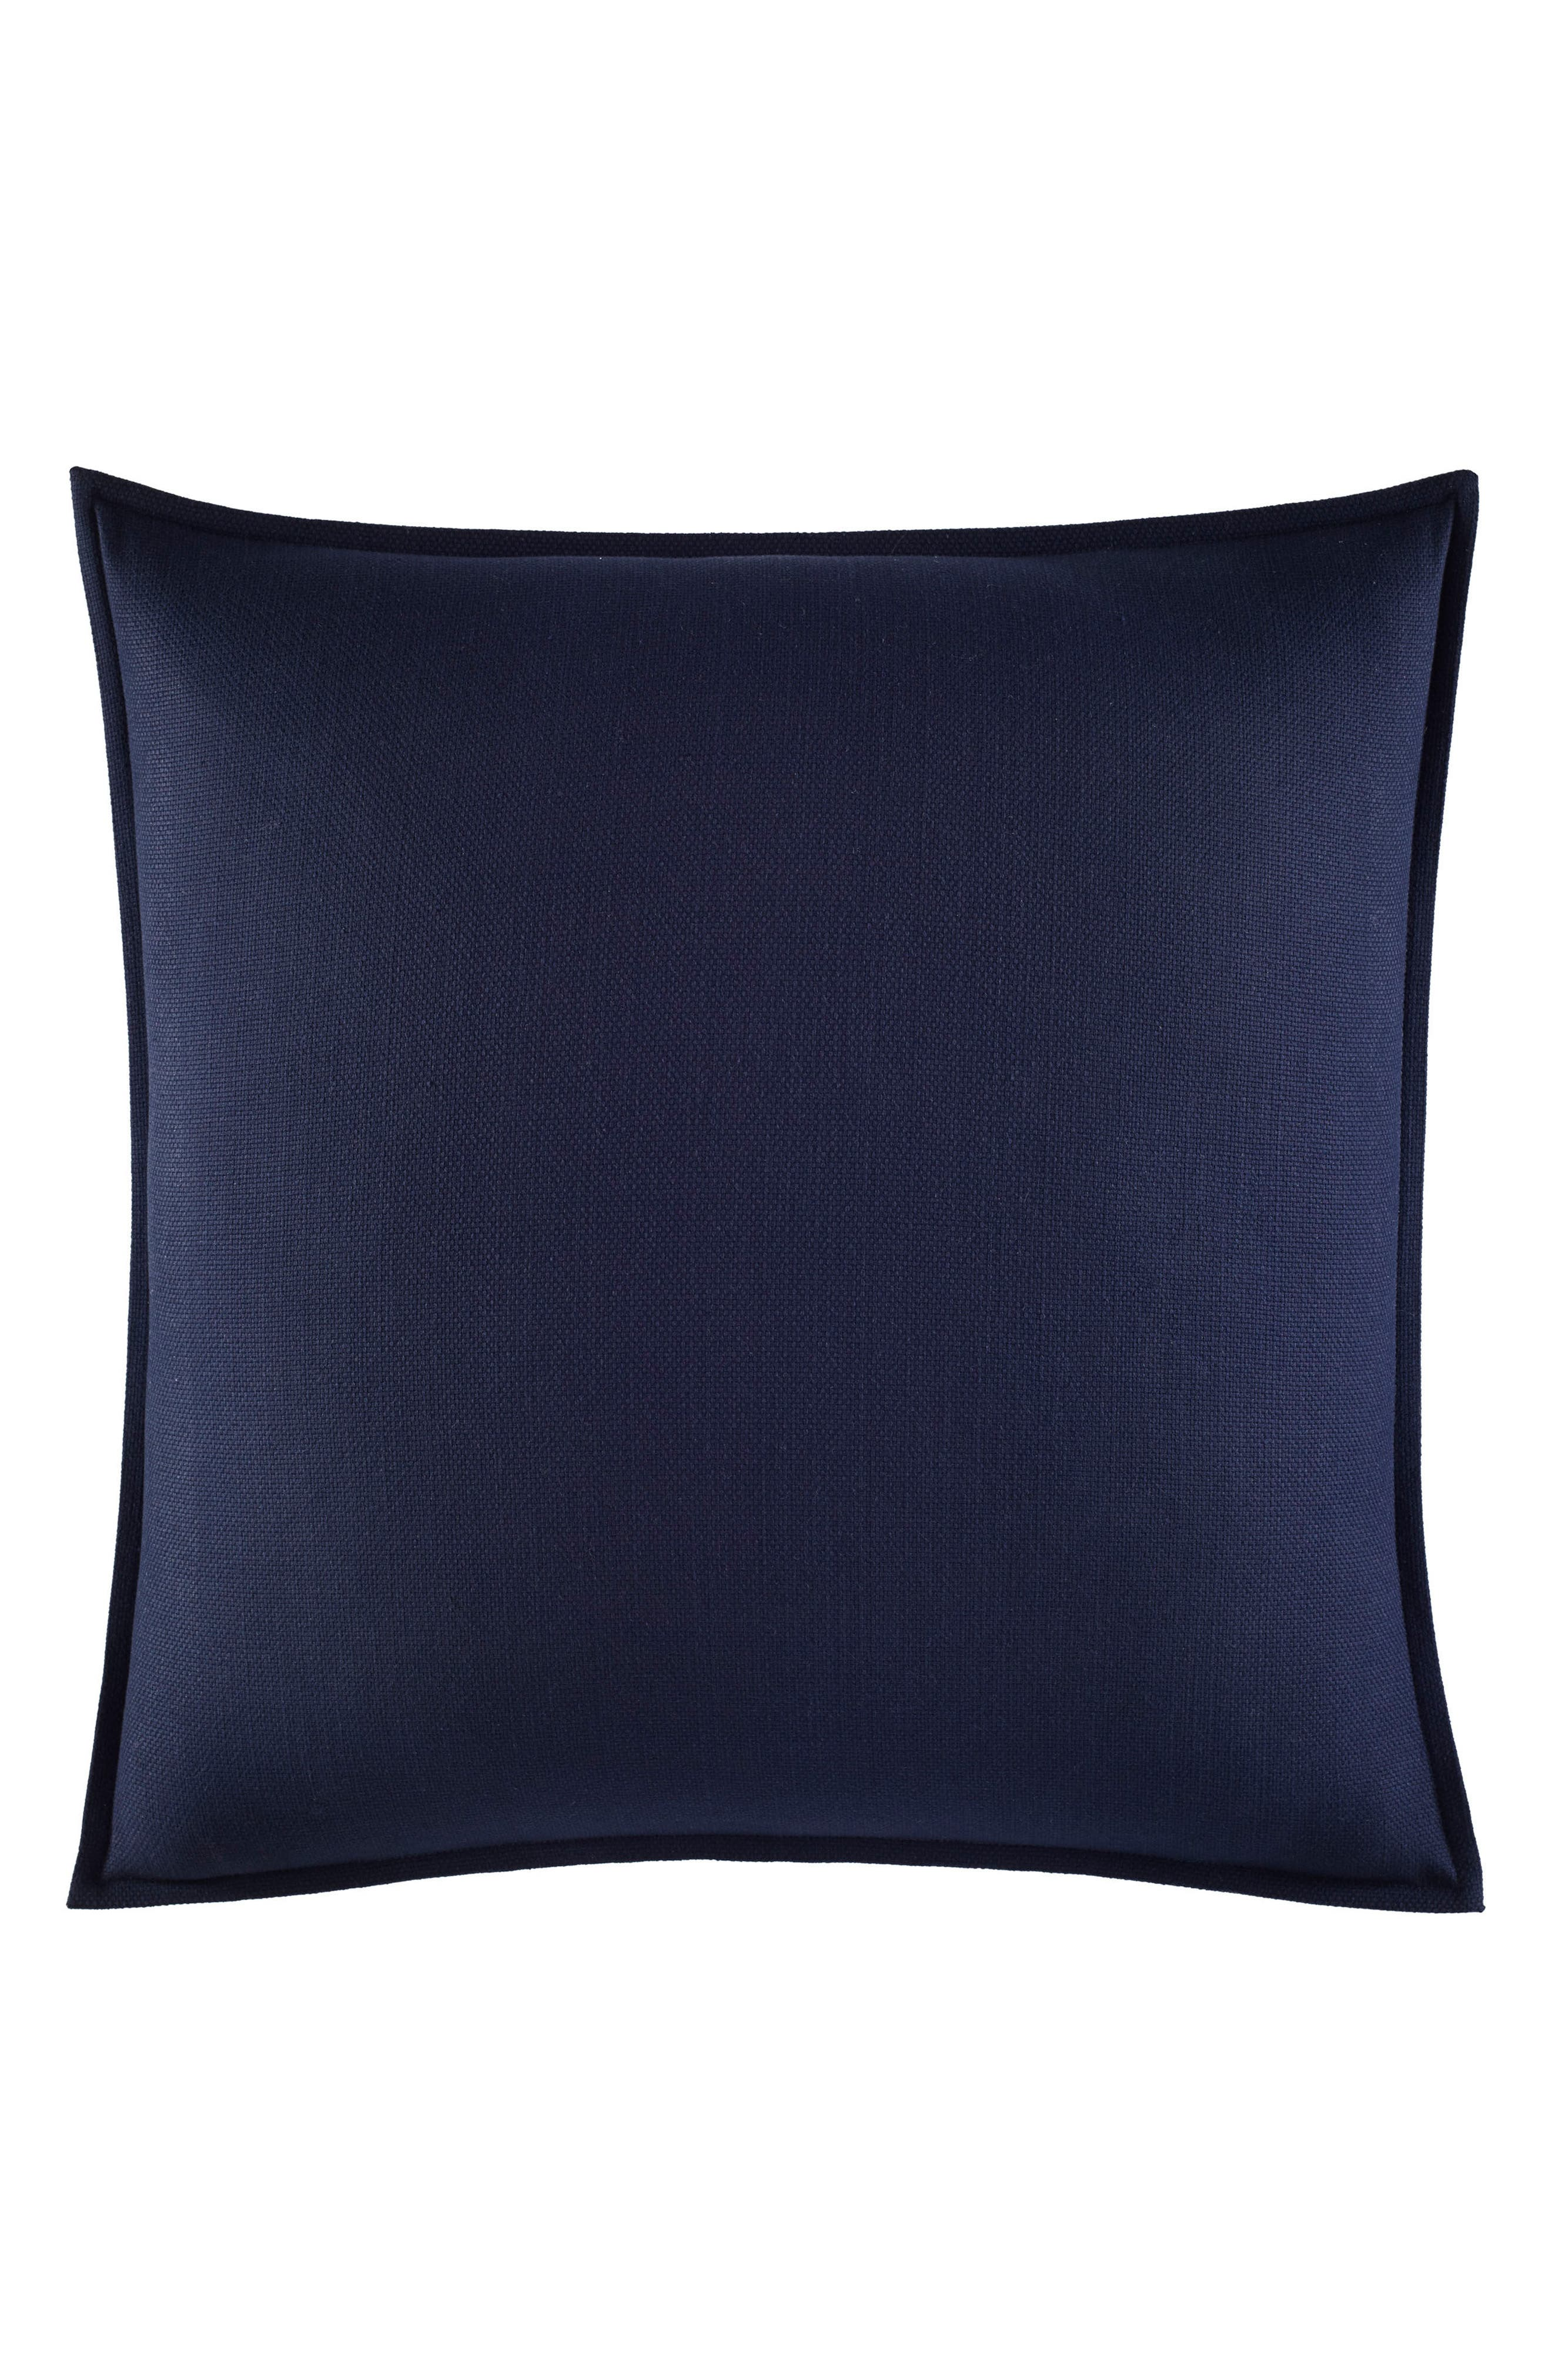 Cunningham Euro Sham,                         Main,                         color, Blue